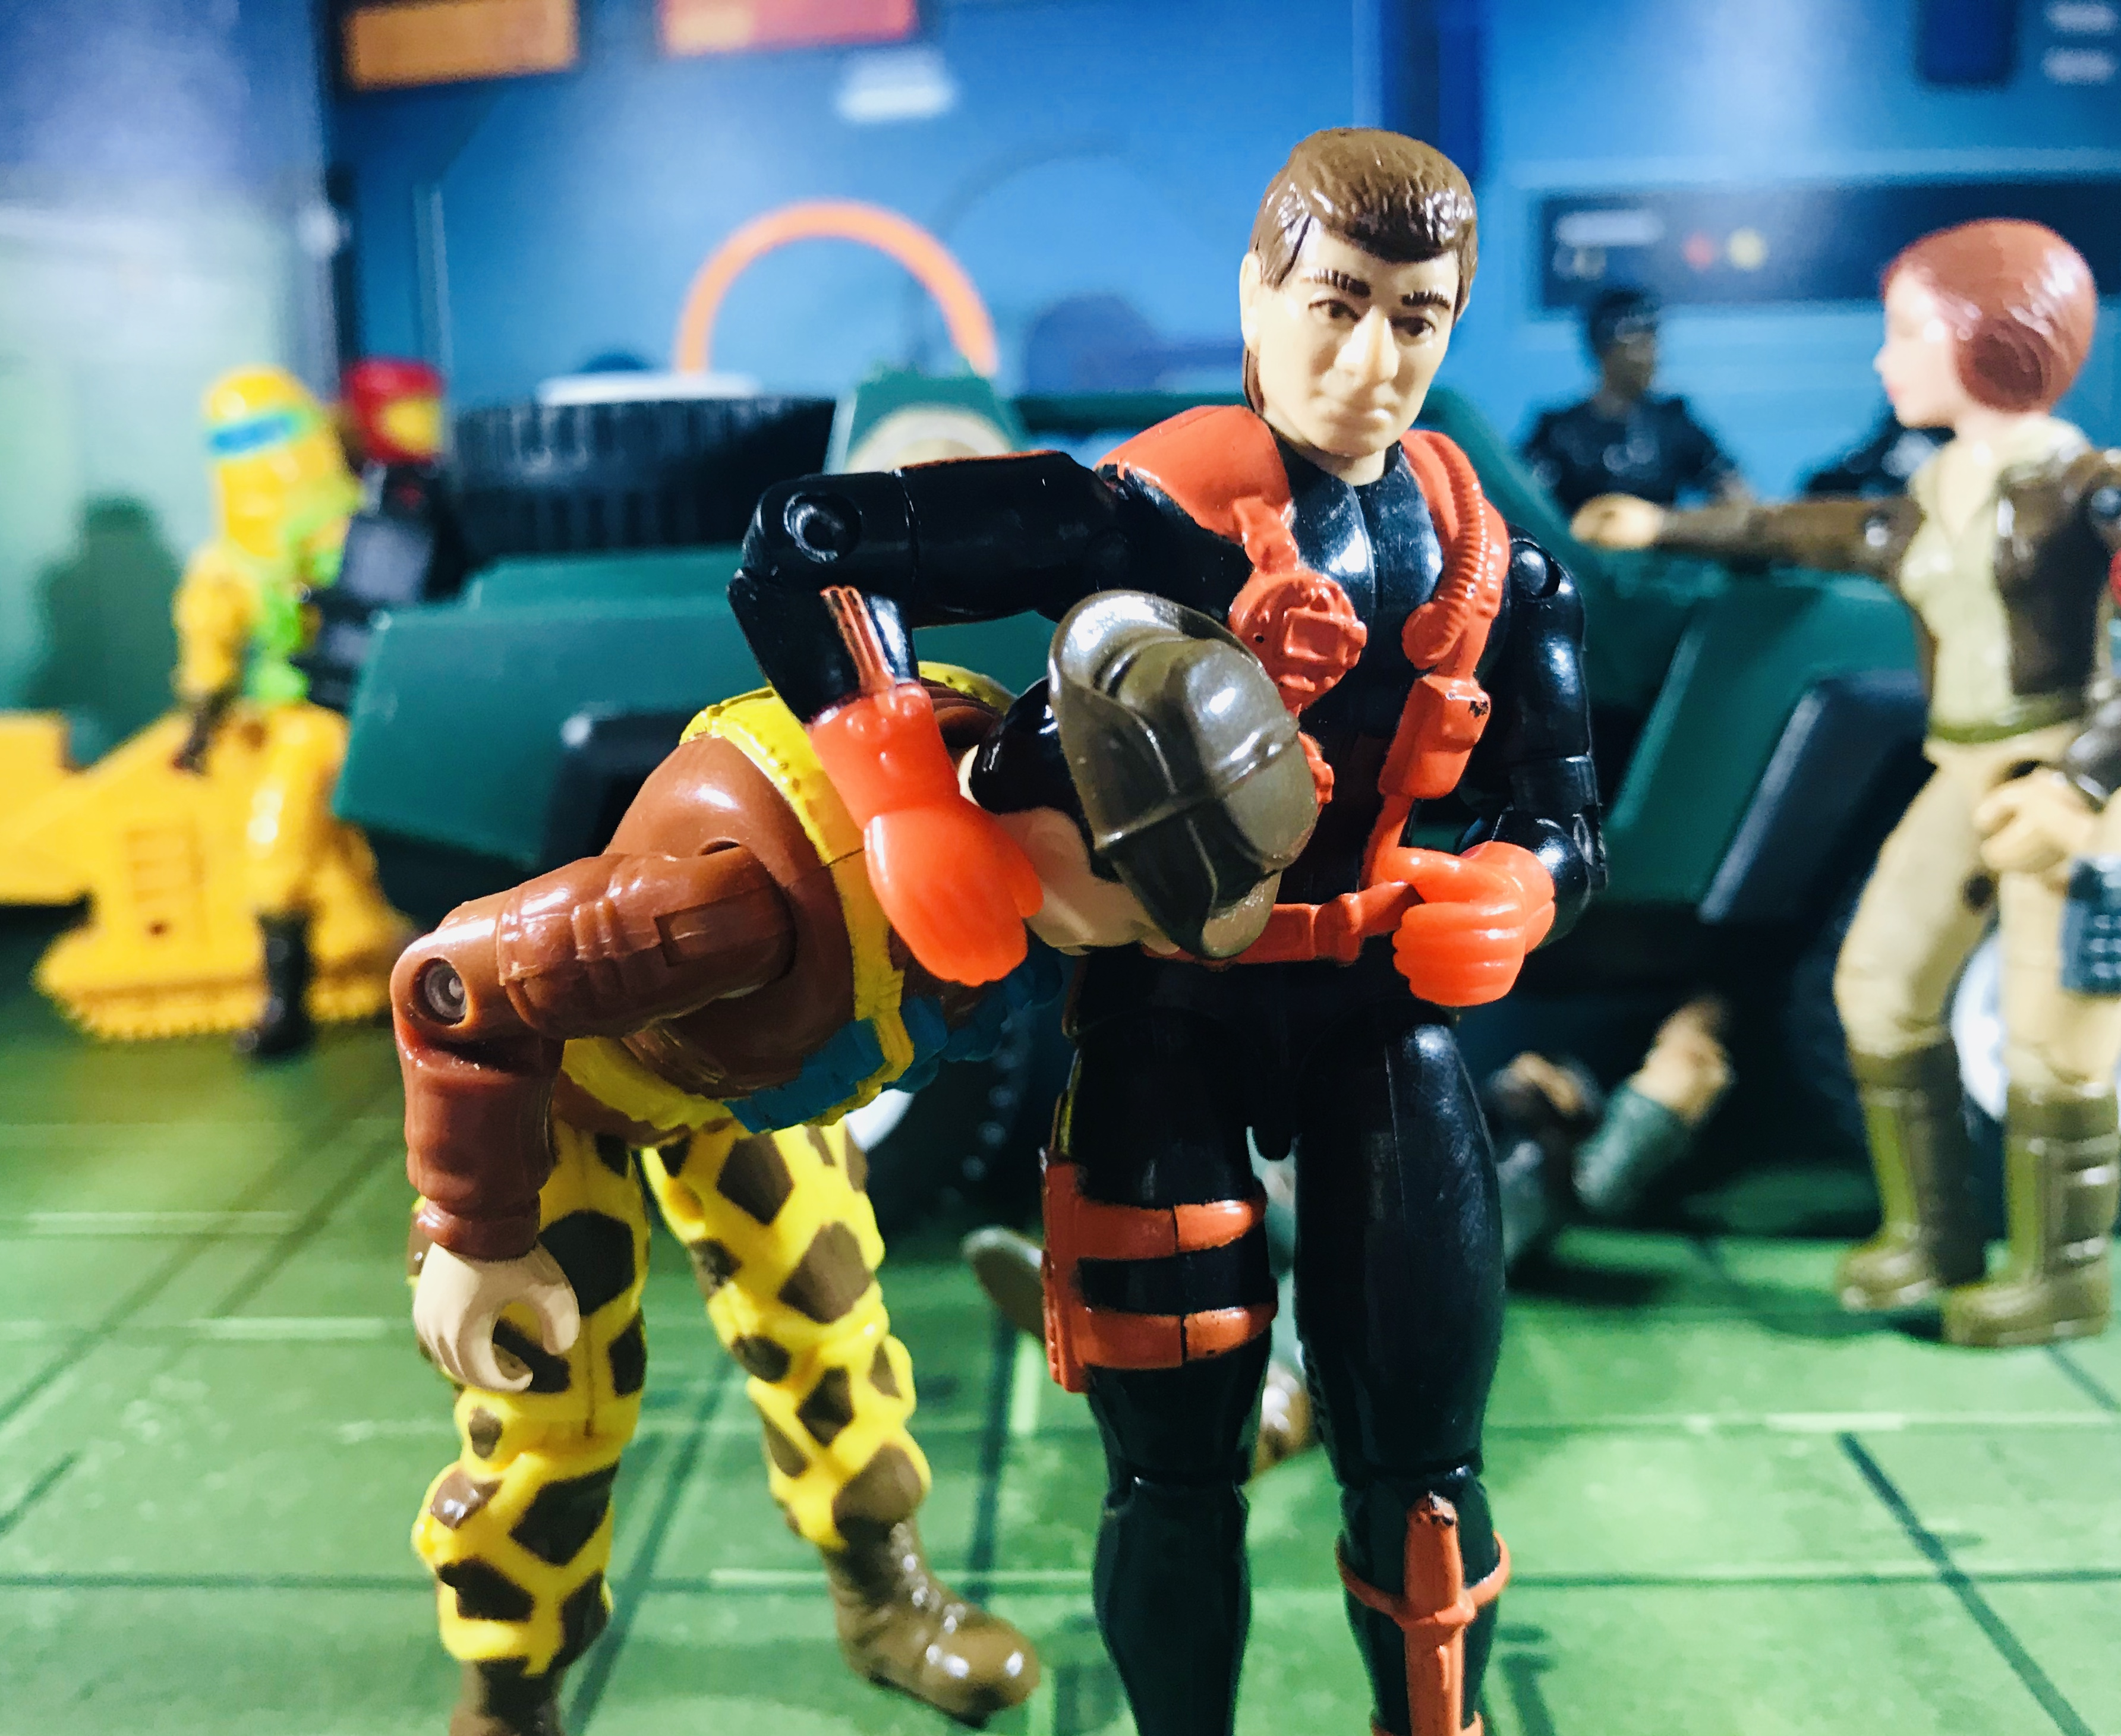 1993 GI Joe Wet-Suit (Battle Corps) – Dragon Fortress